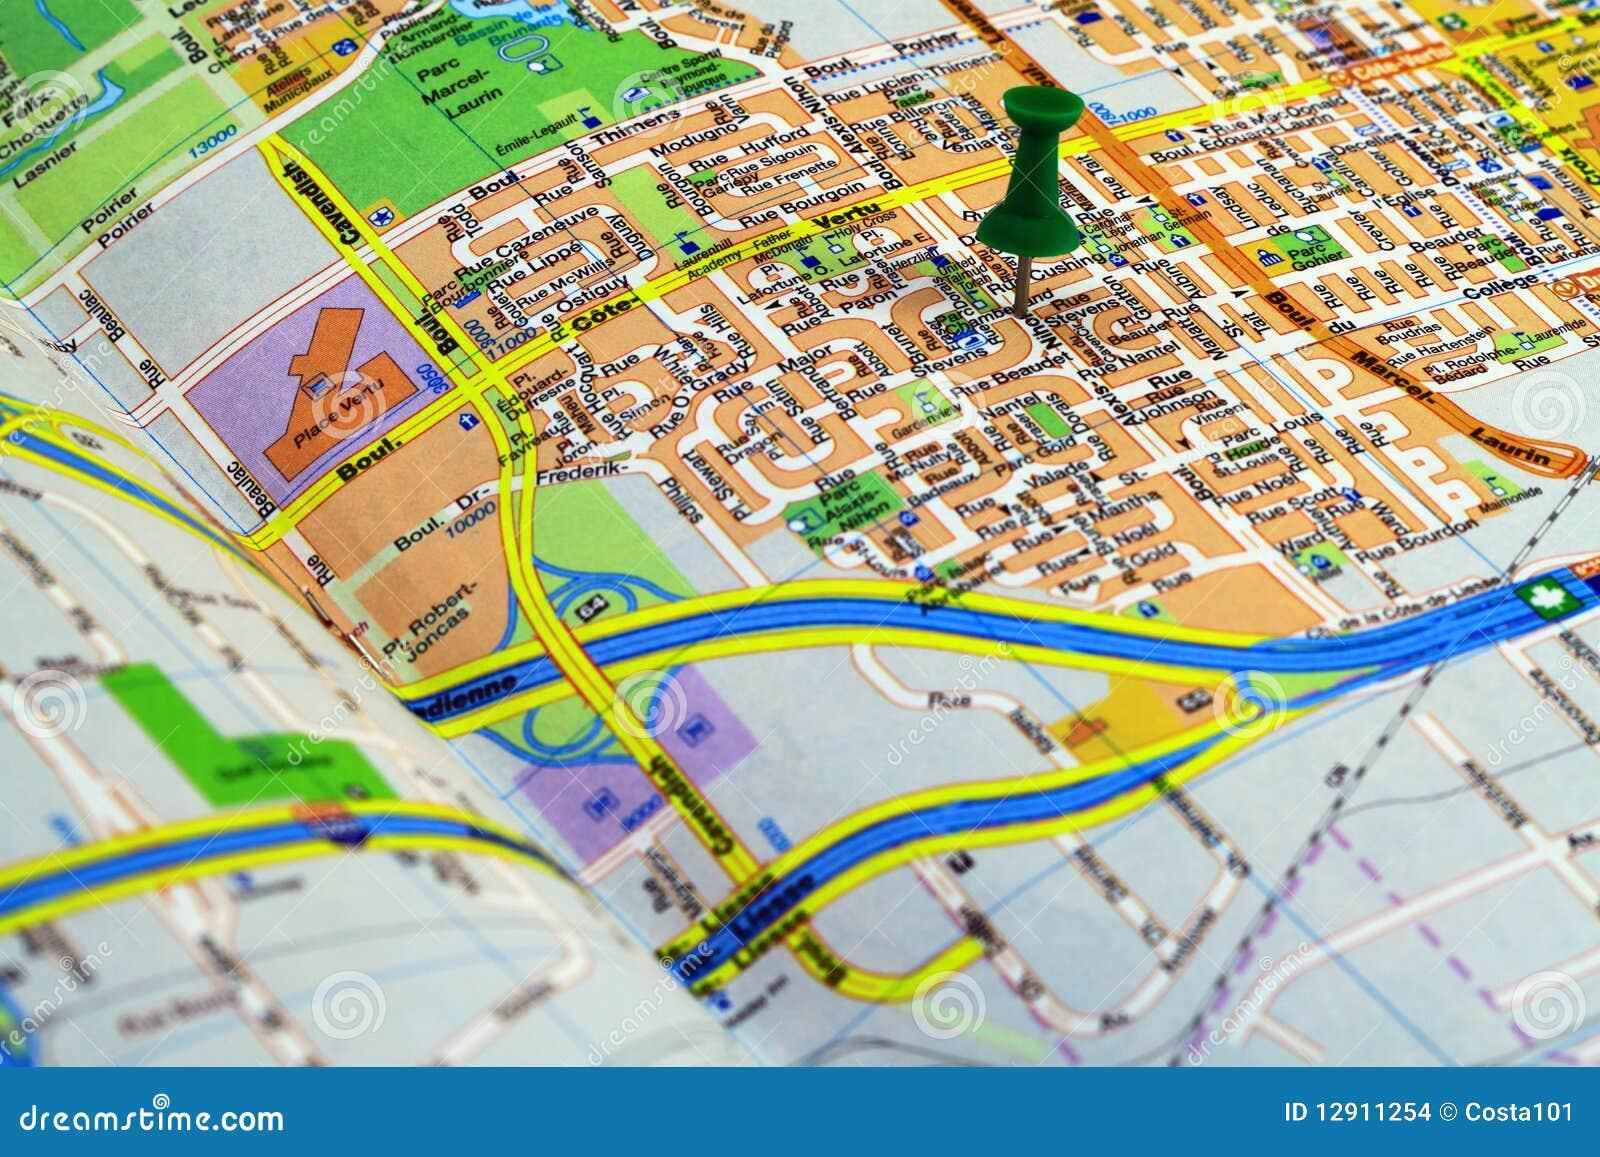 Pushpin on a map stock photo. Image of journey, geography ...  Pushpin Map